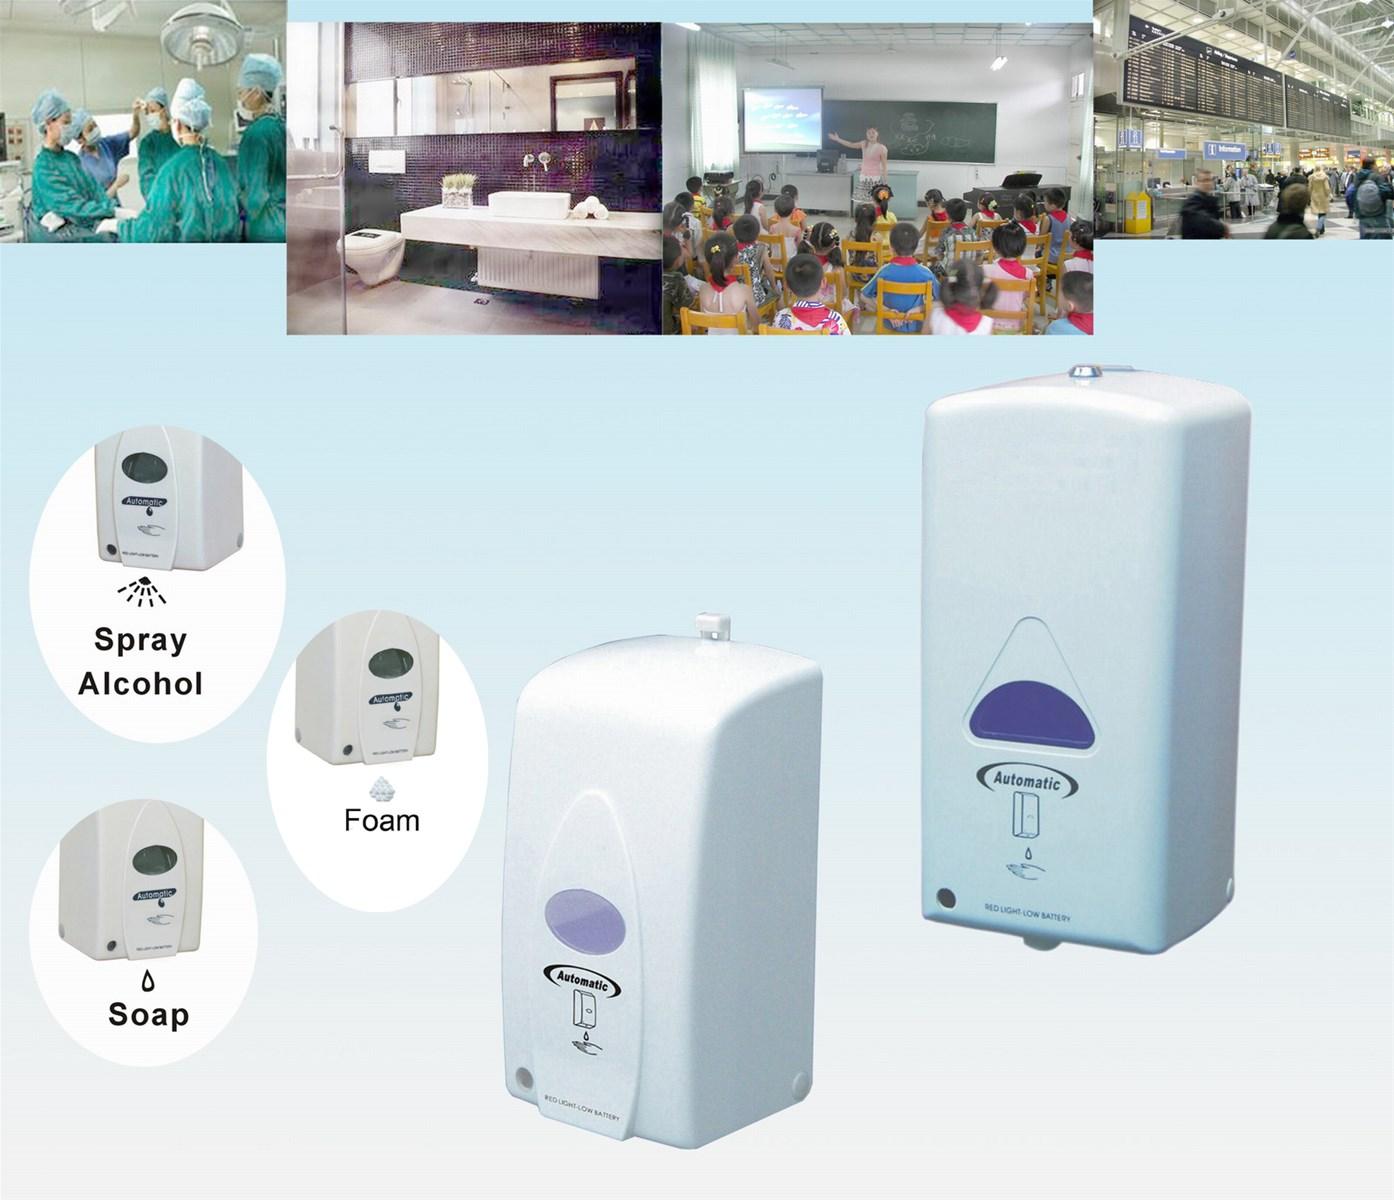 Automatic Foam Soap Dispenser Foaming Sanitizer Dispenser with refillable bottle and disposable bag